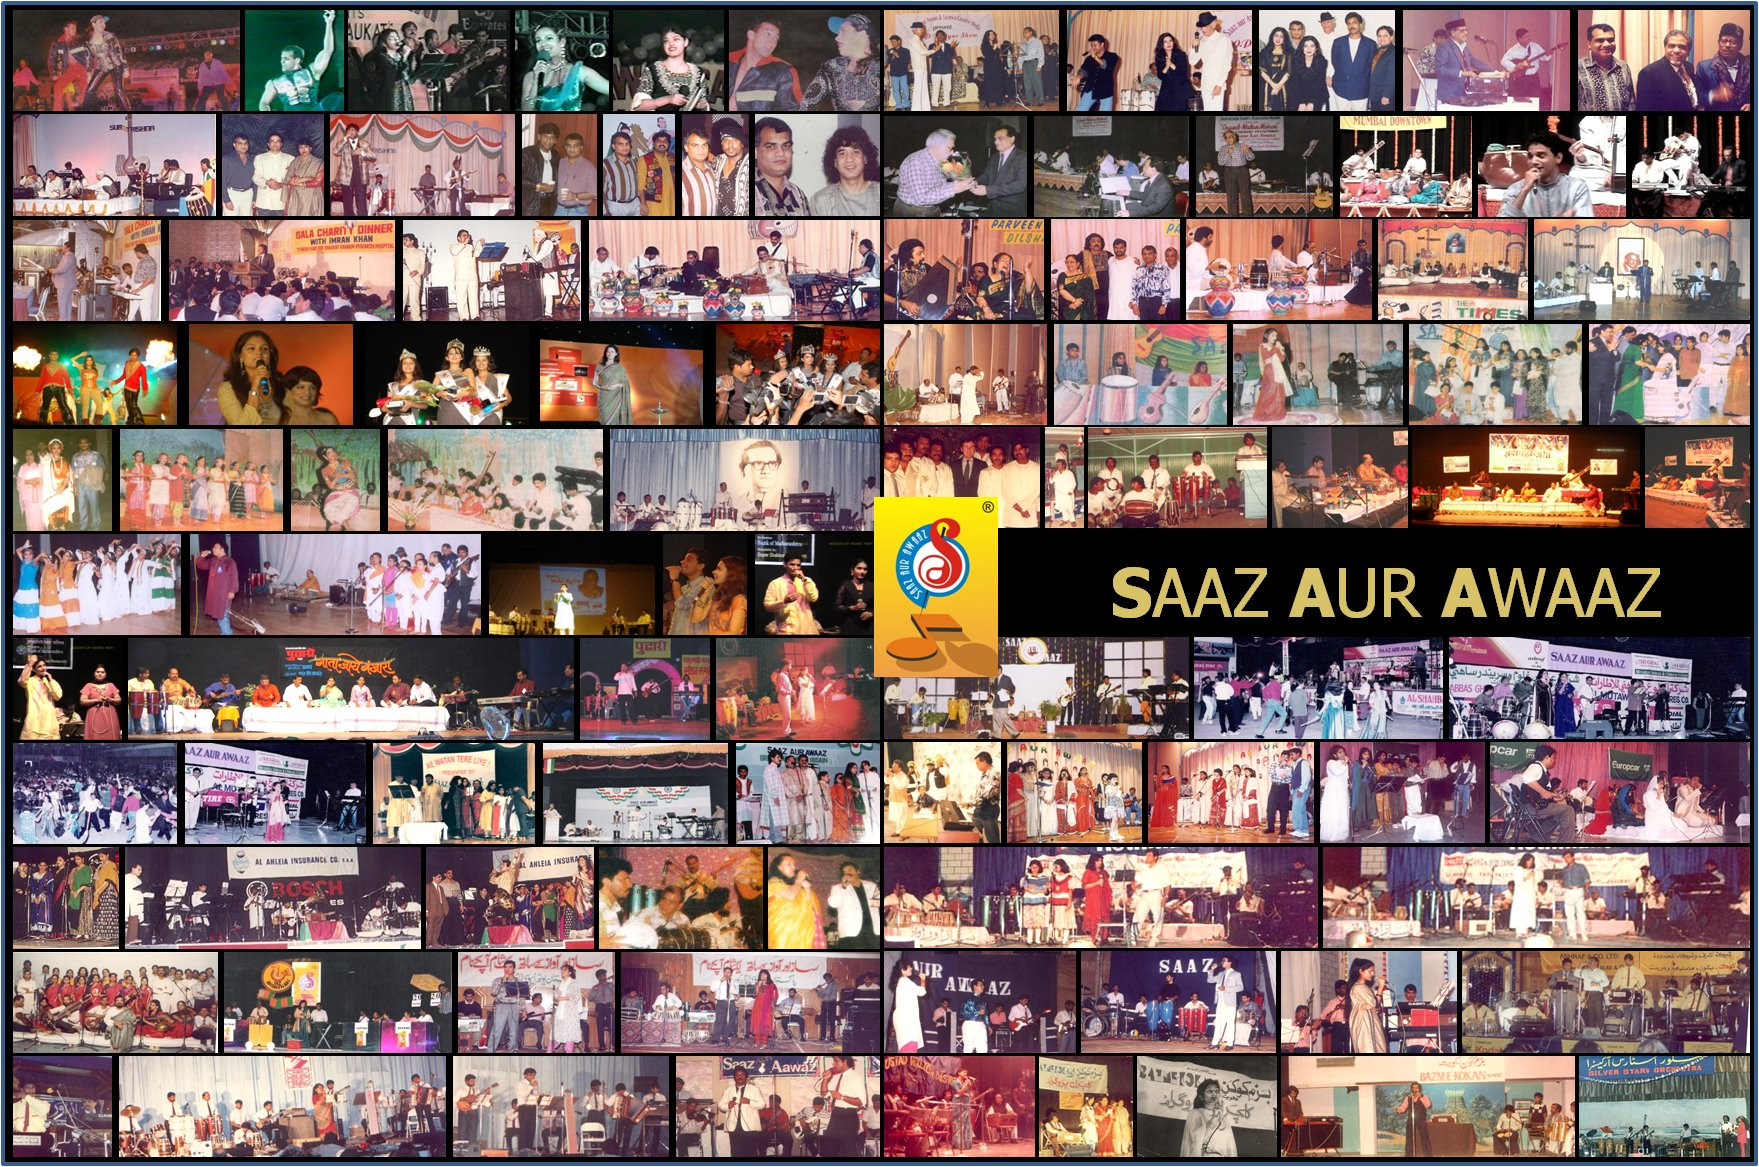 Saaz Aur Awaaz